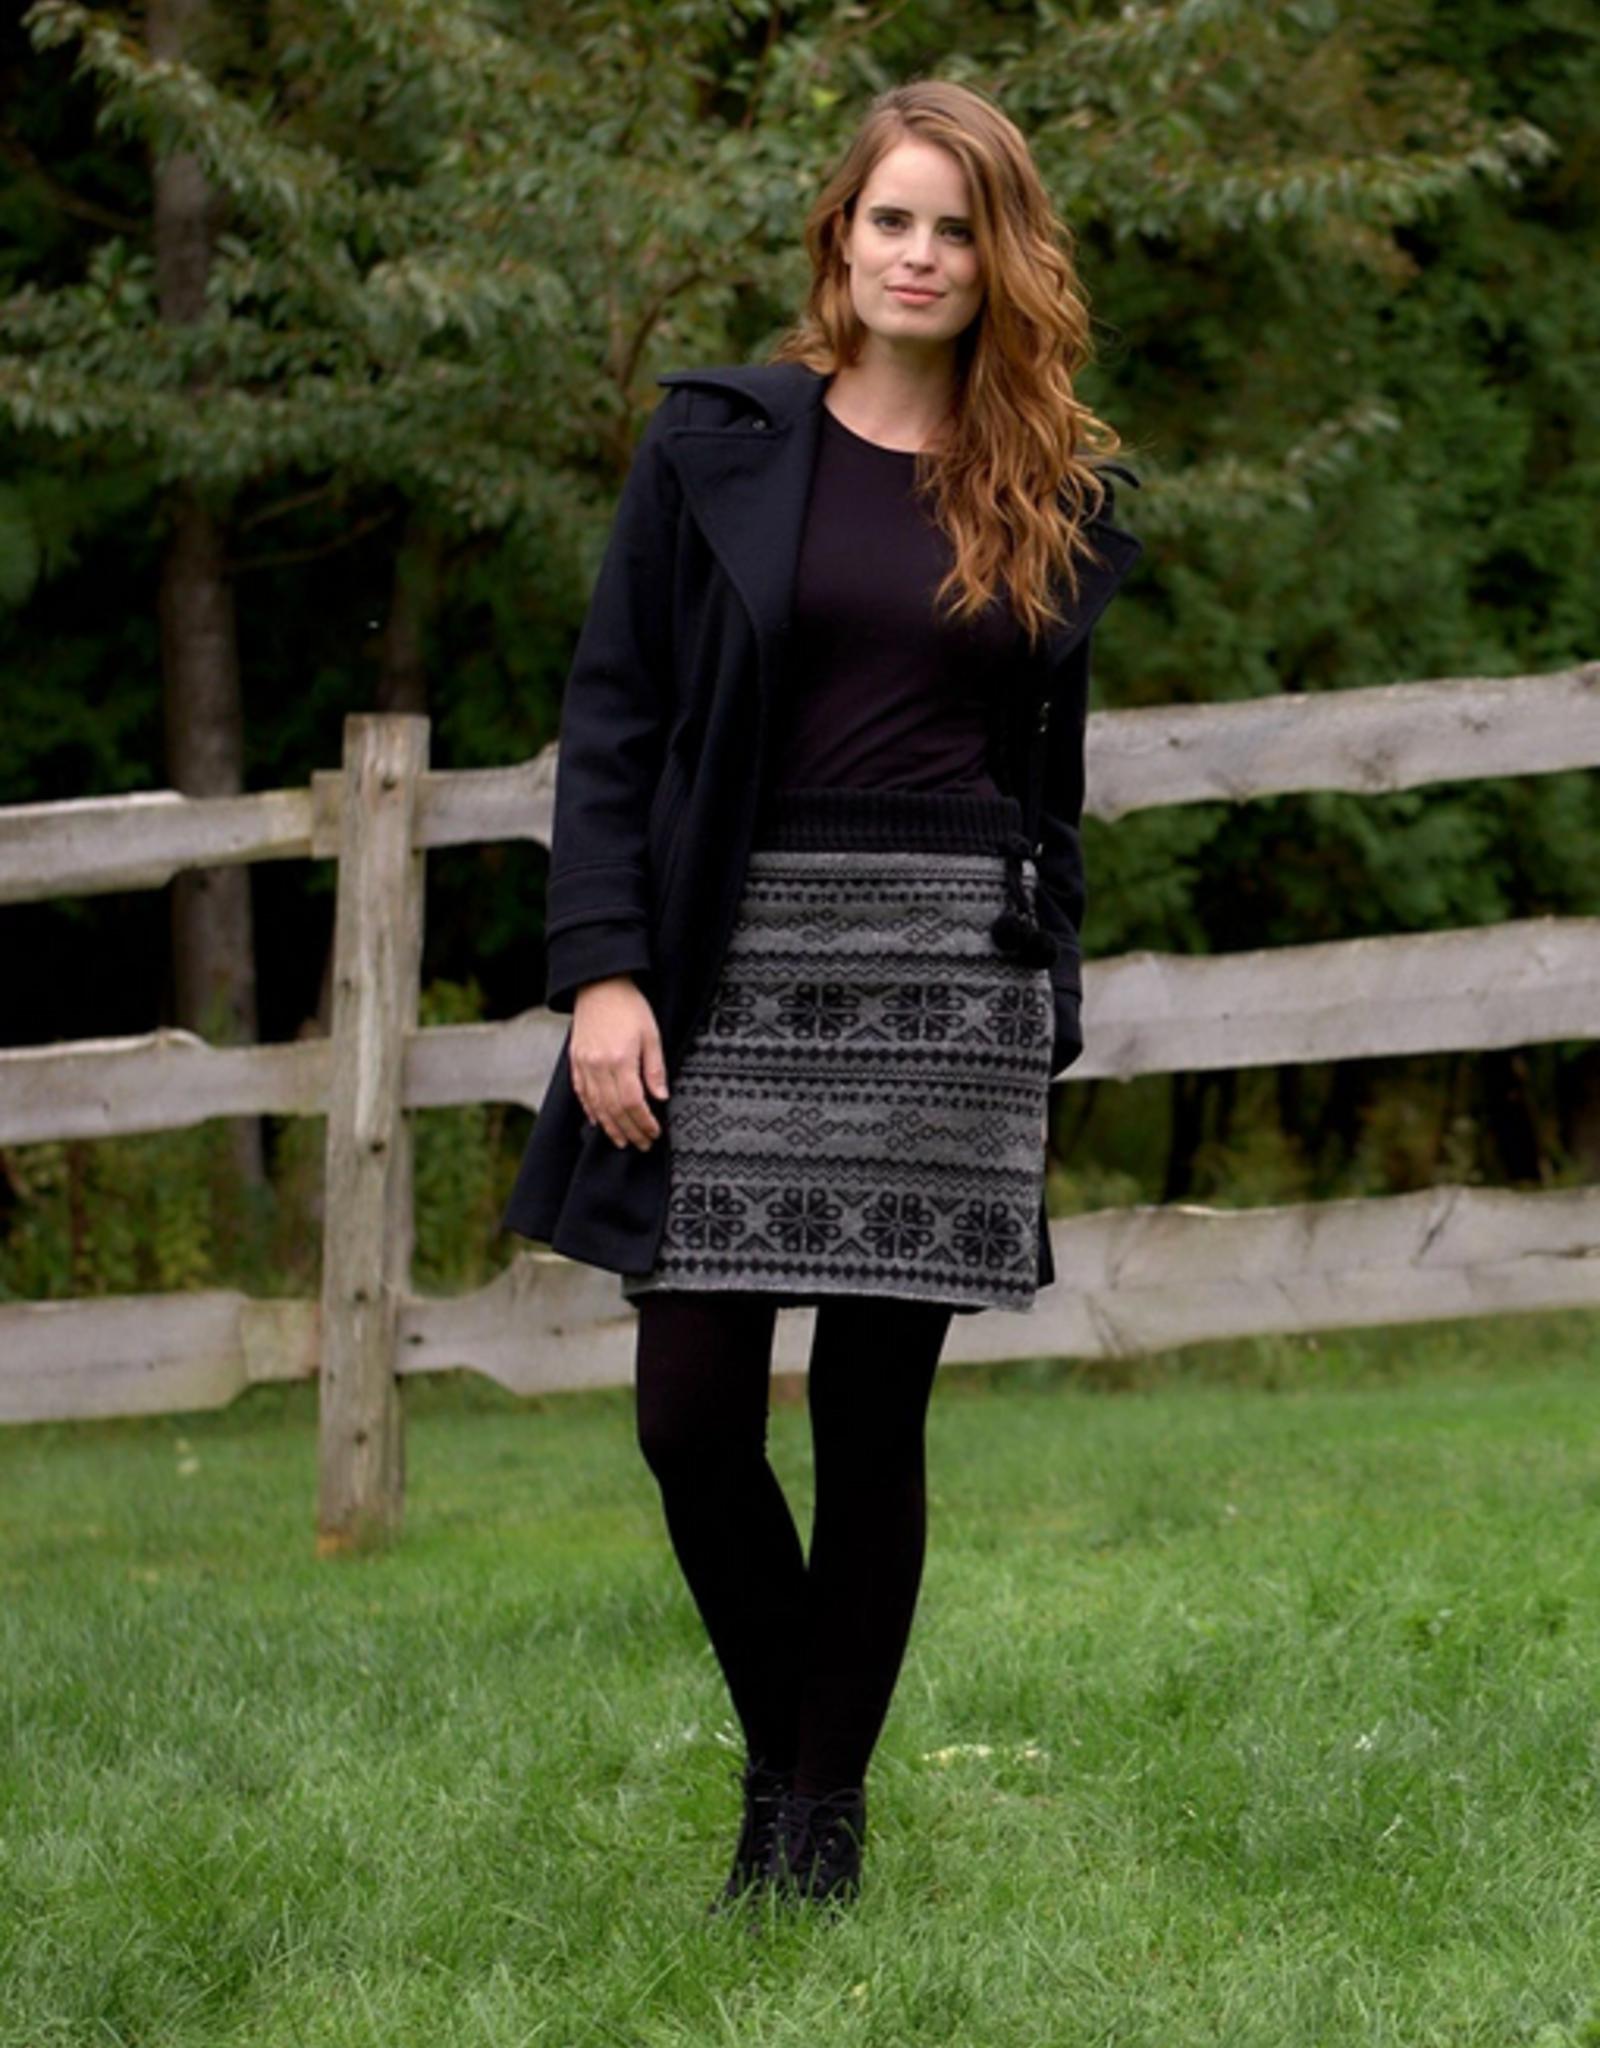 Eva Skirt Stretch Fabric Lined (2 Colors!)